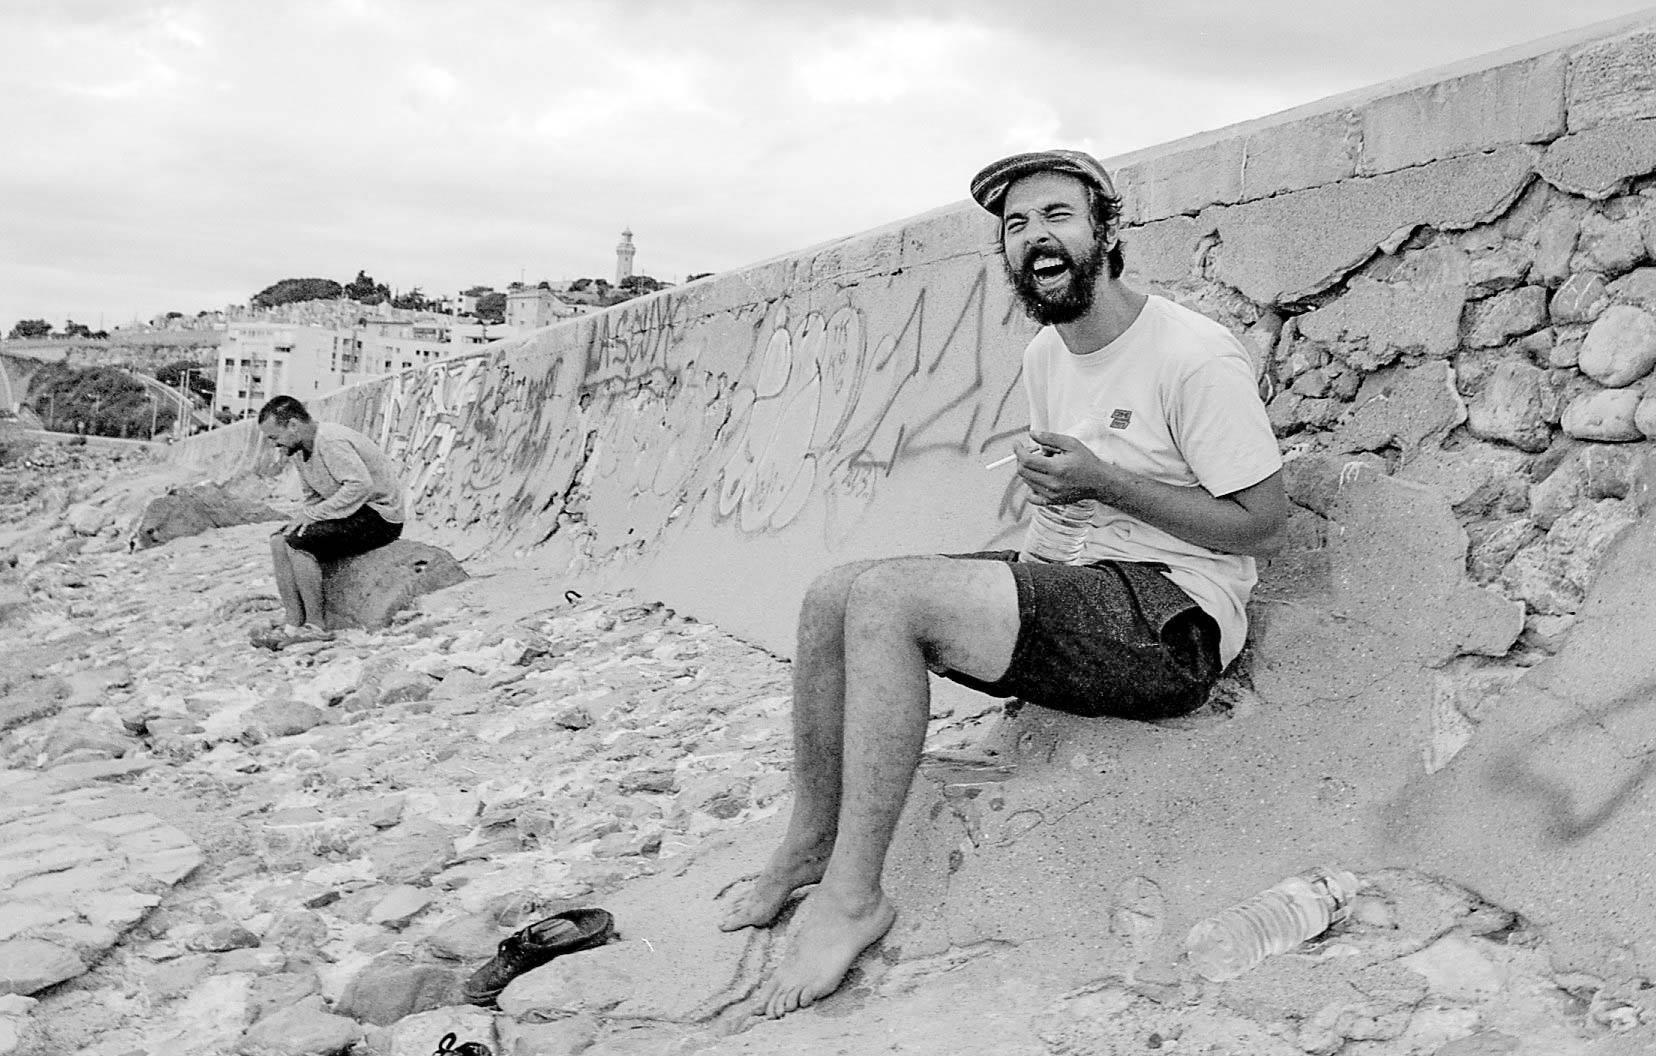 Iretge ulule radar argentique livre projet soutien portraits brokovitch - Coup de pouce RADAR x Ulule : IRETGE